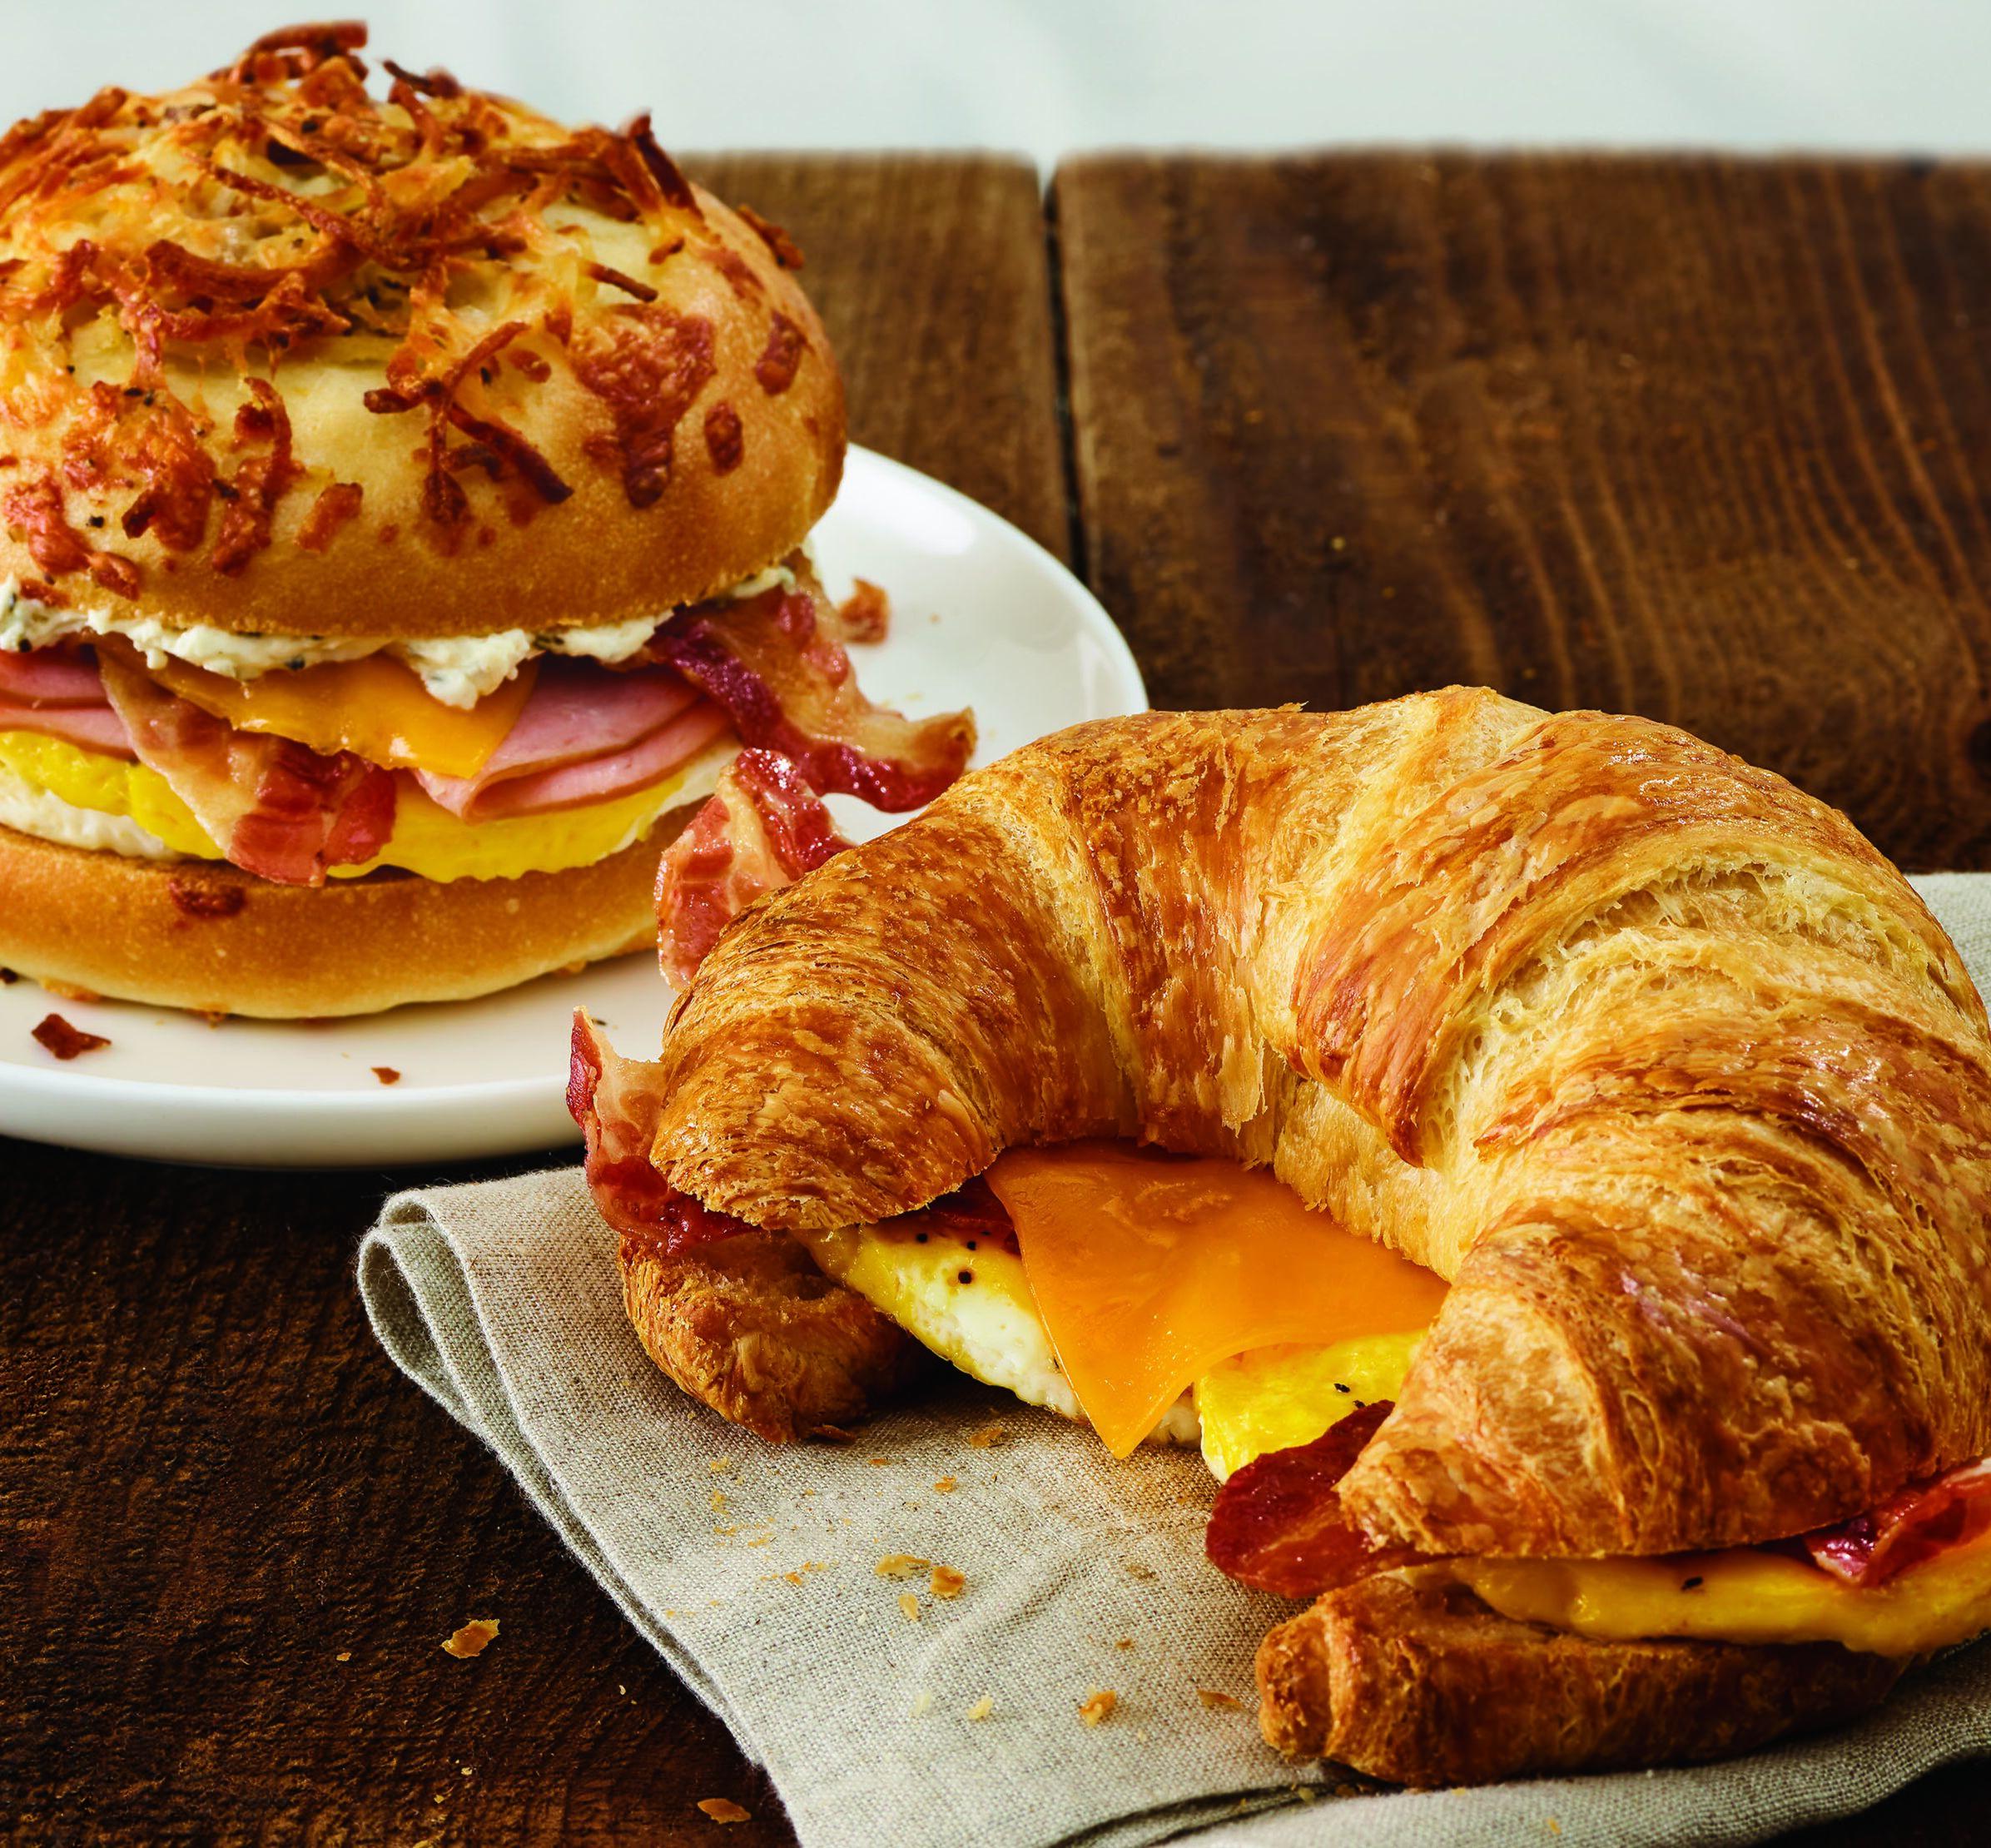 Move over bagels, Einstein Bros. Bagels adds a croissant sandwich